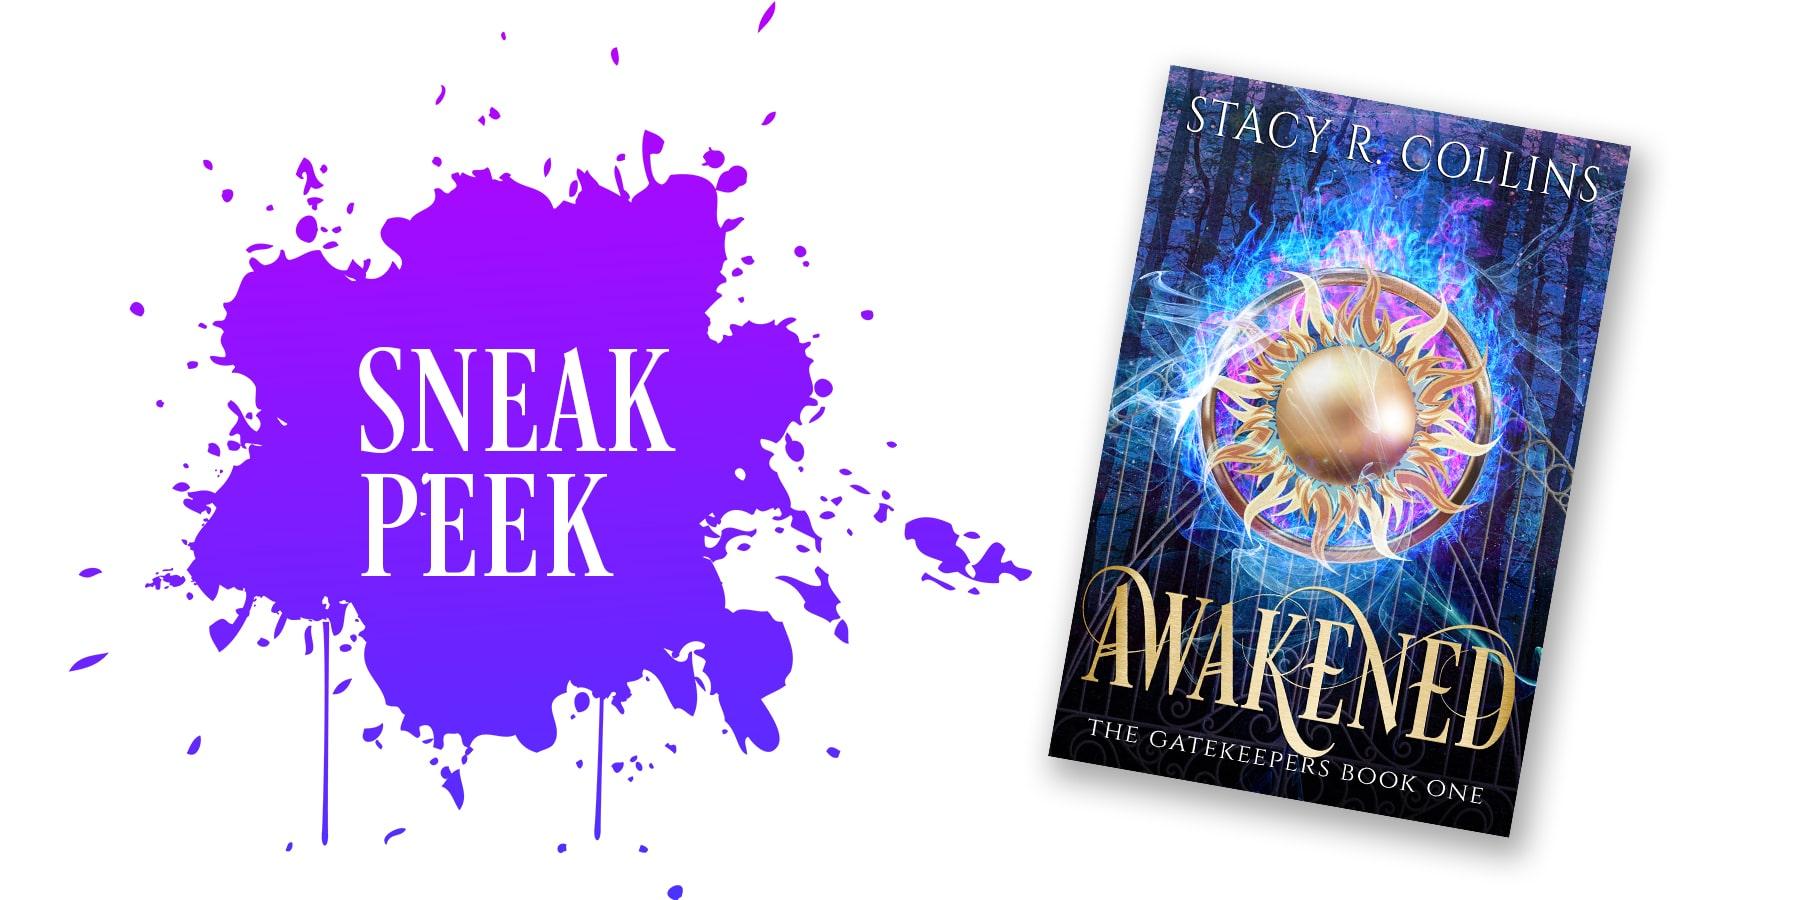 Sneak Peek: Awakened